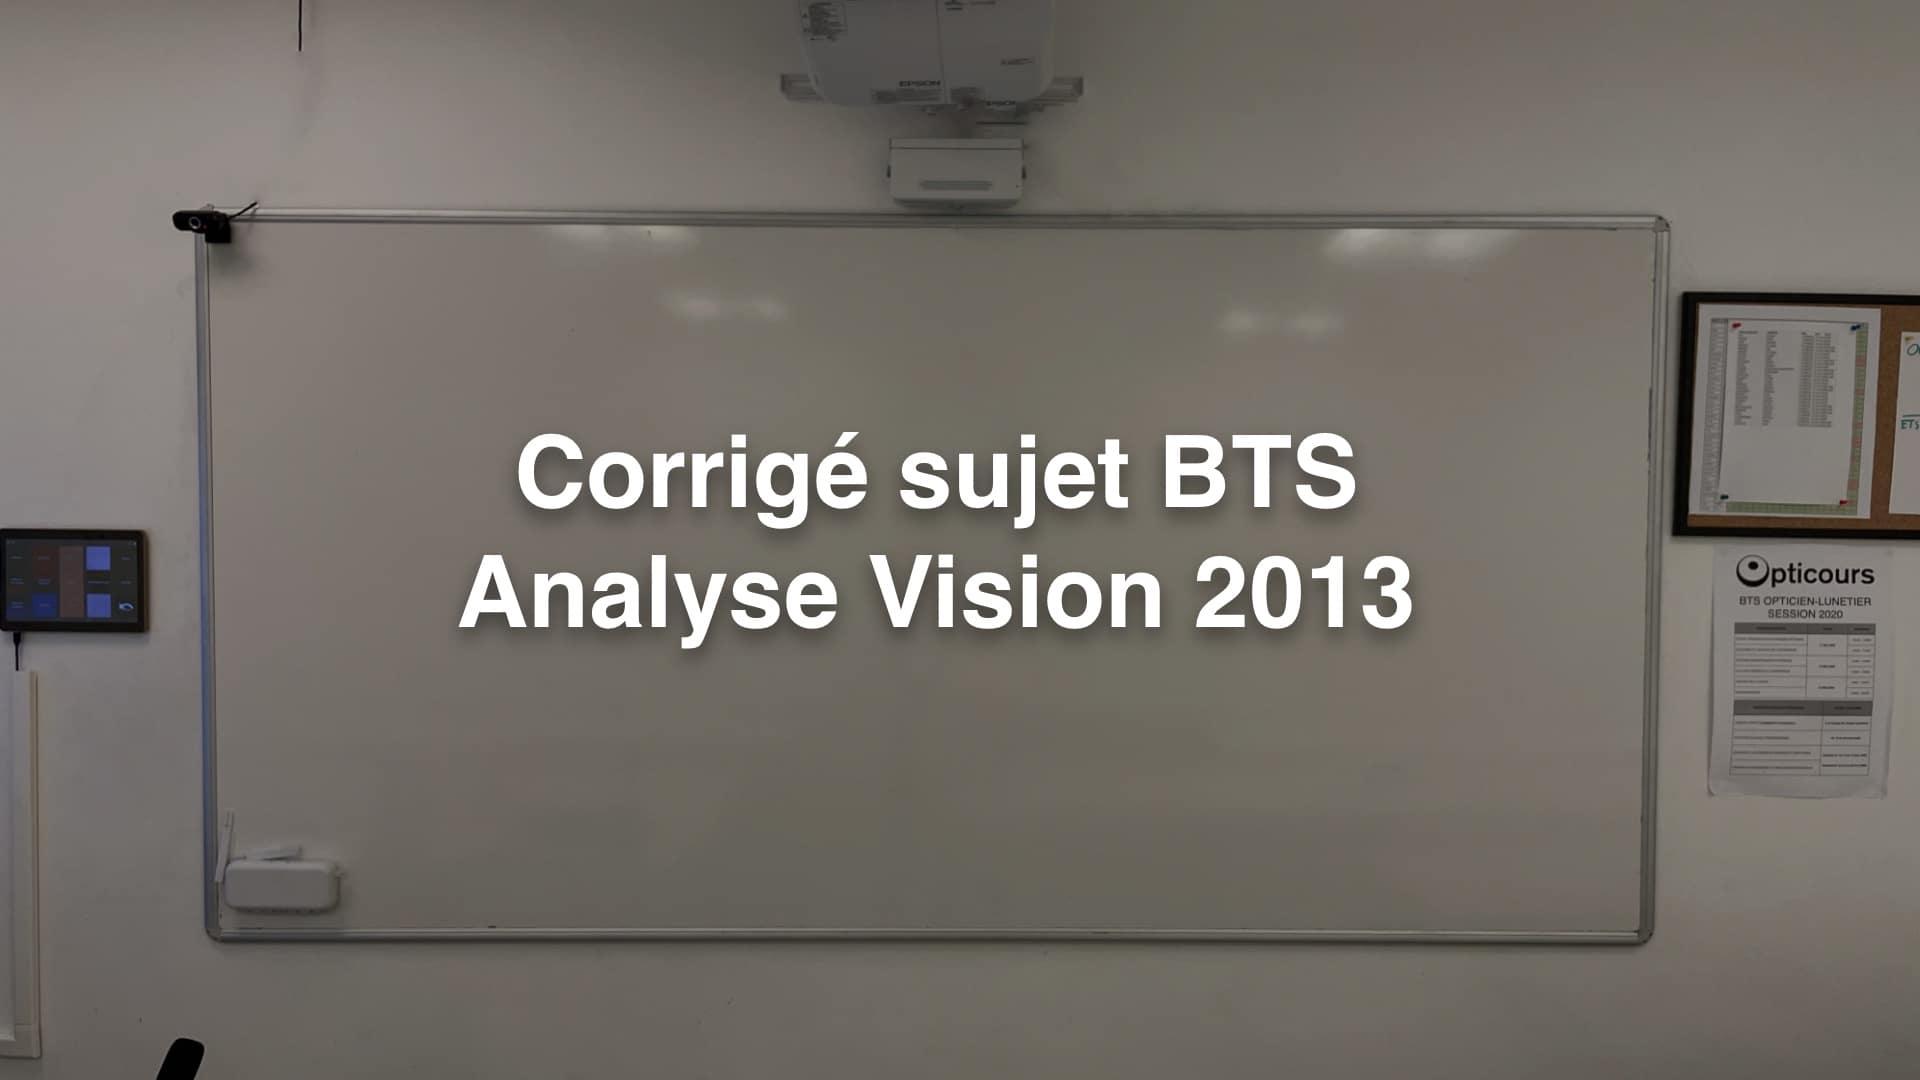 Corrigé sujet BTS Analyse Vision 2013